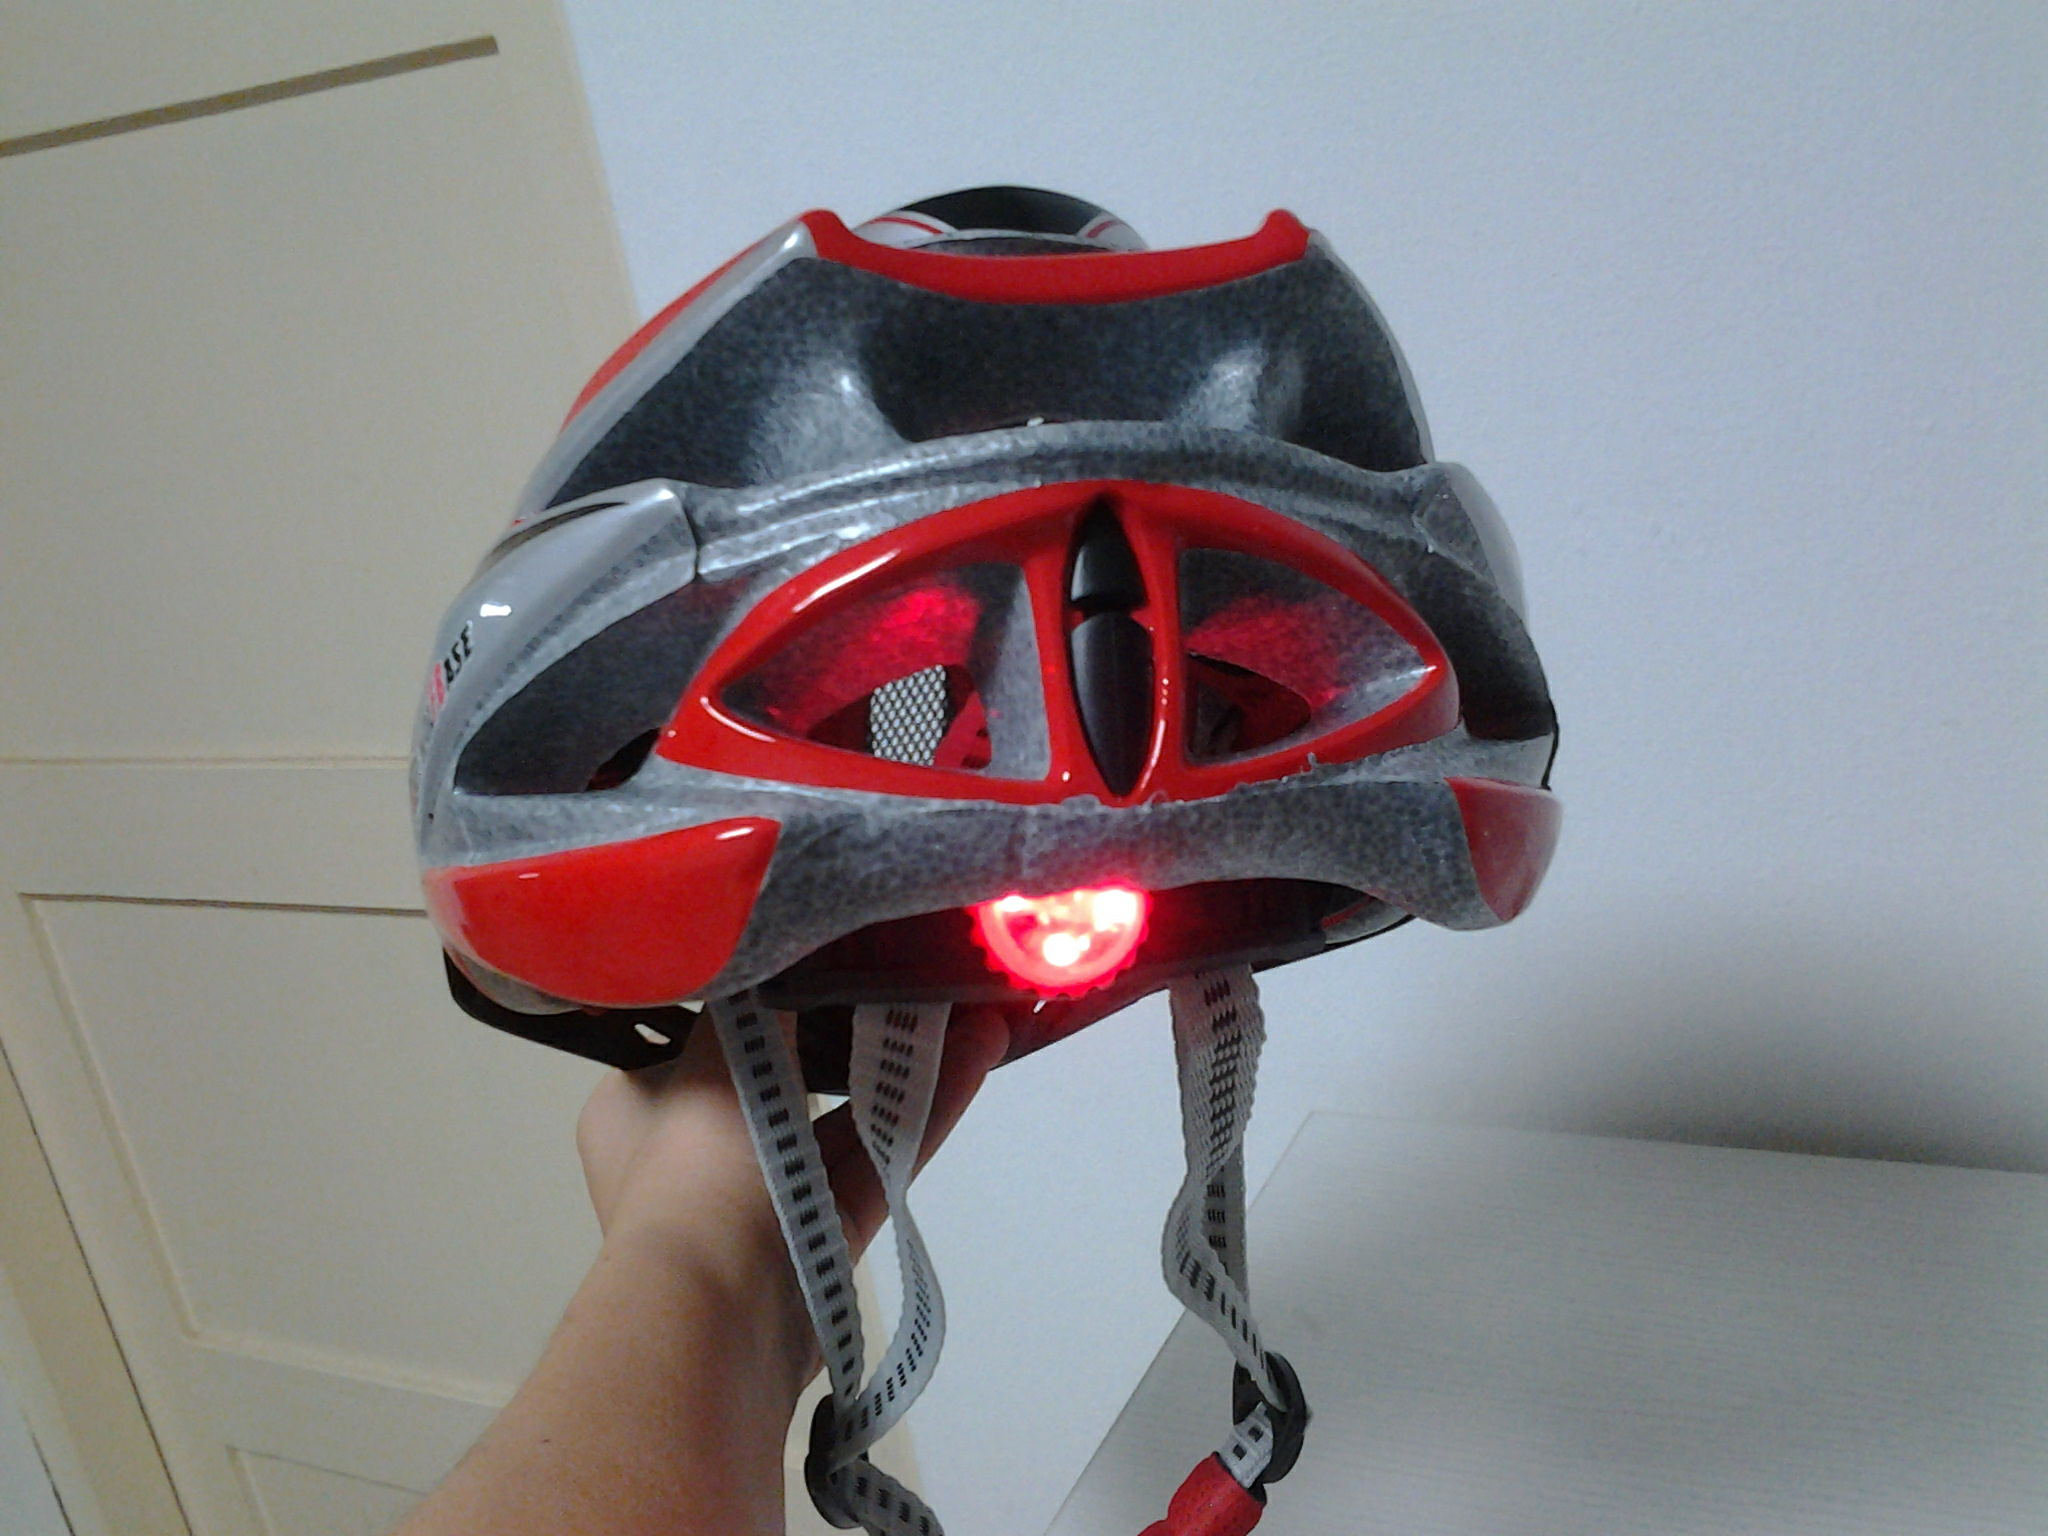 helmet with alarm lighting1.jpg